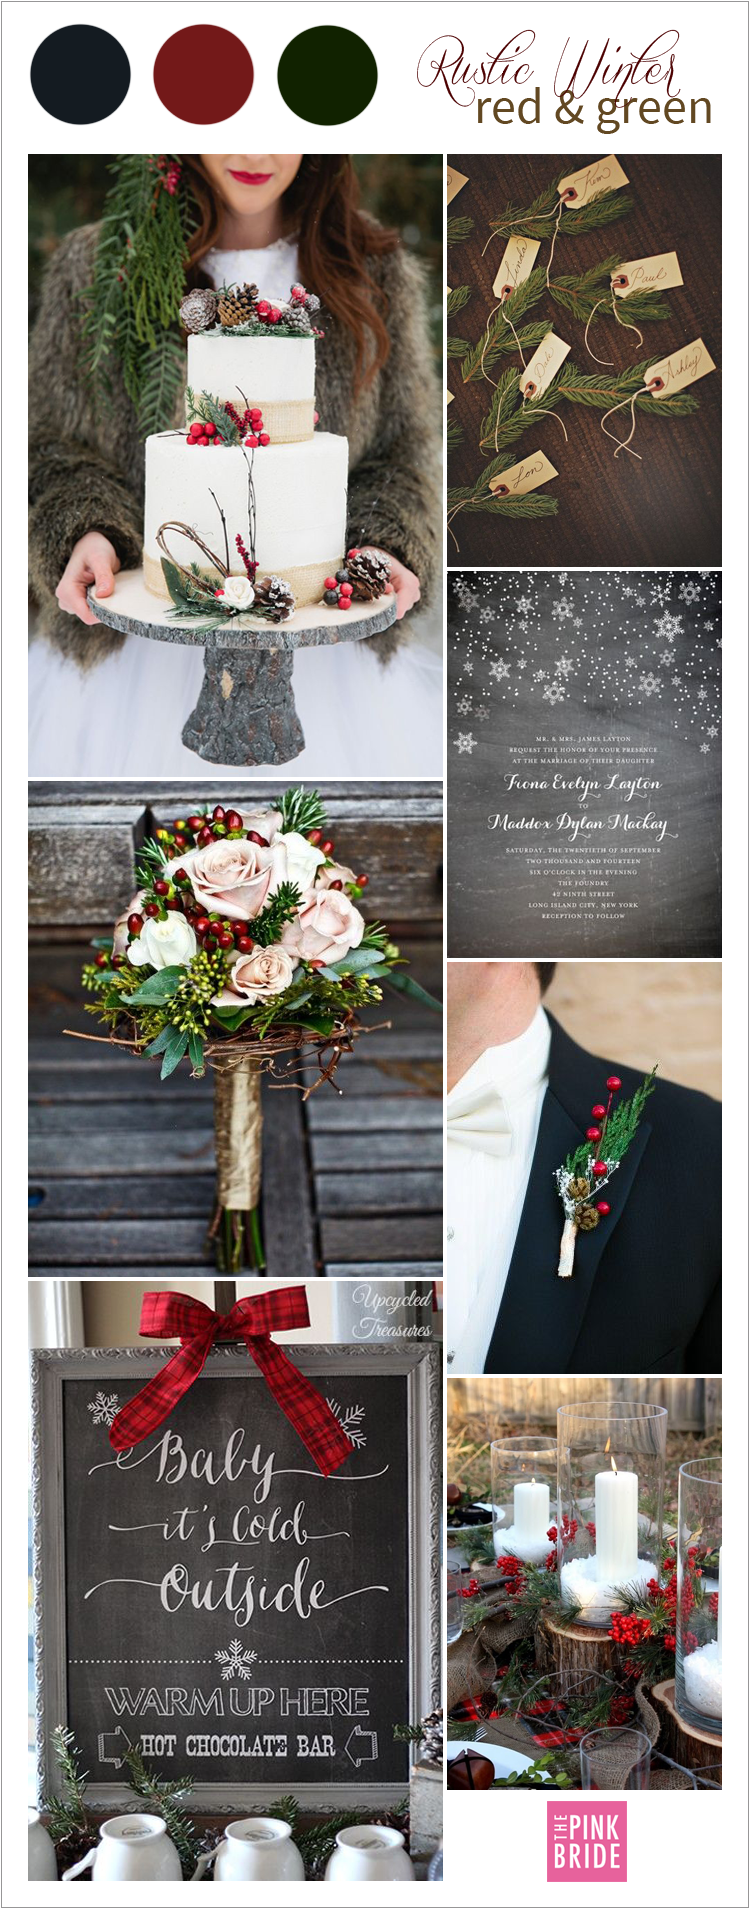 Wedding Color Board: Rustic Winter Red & Green - The Pink Bride